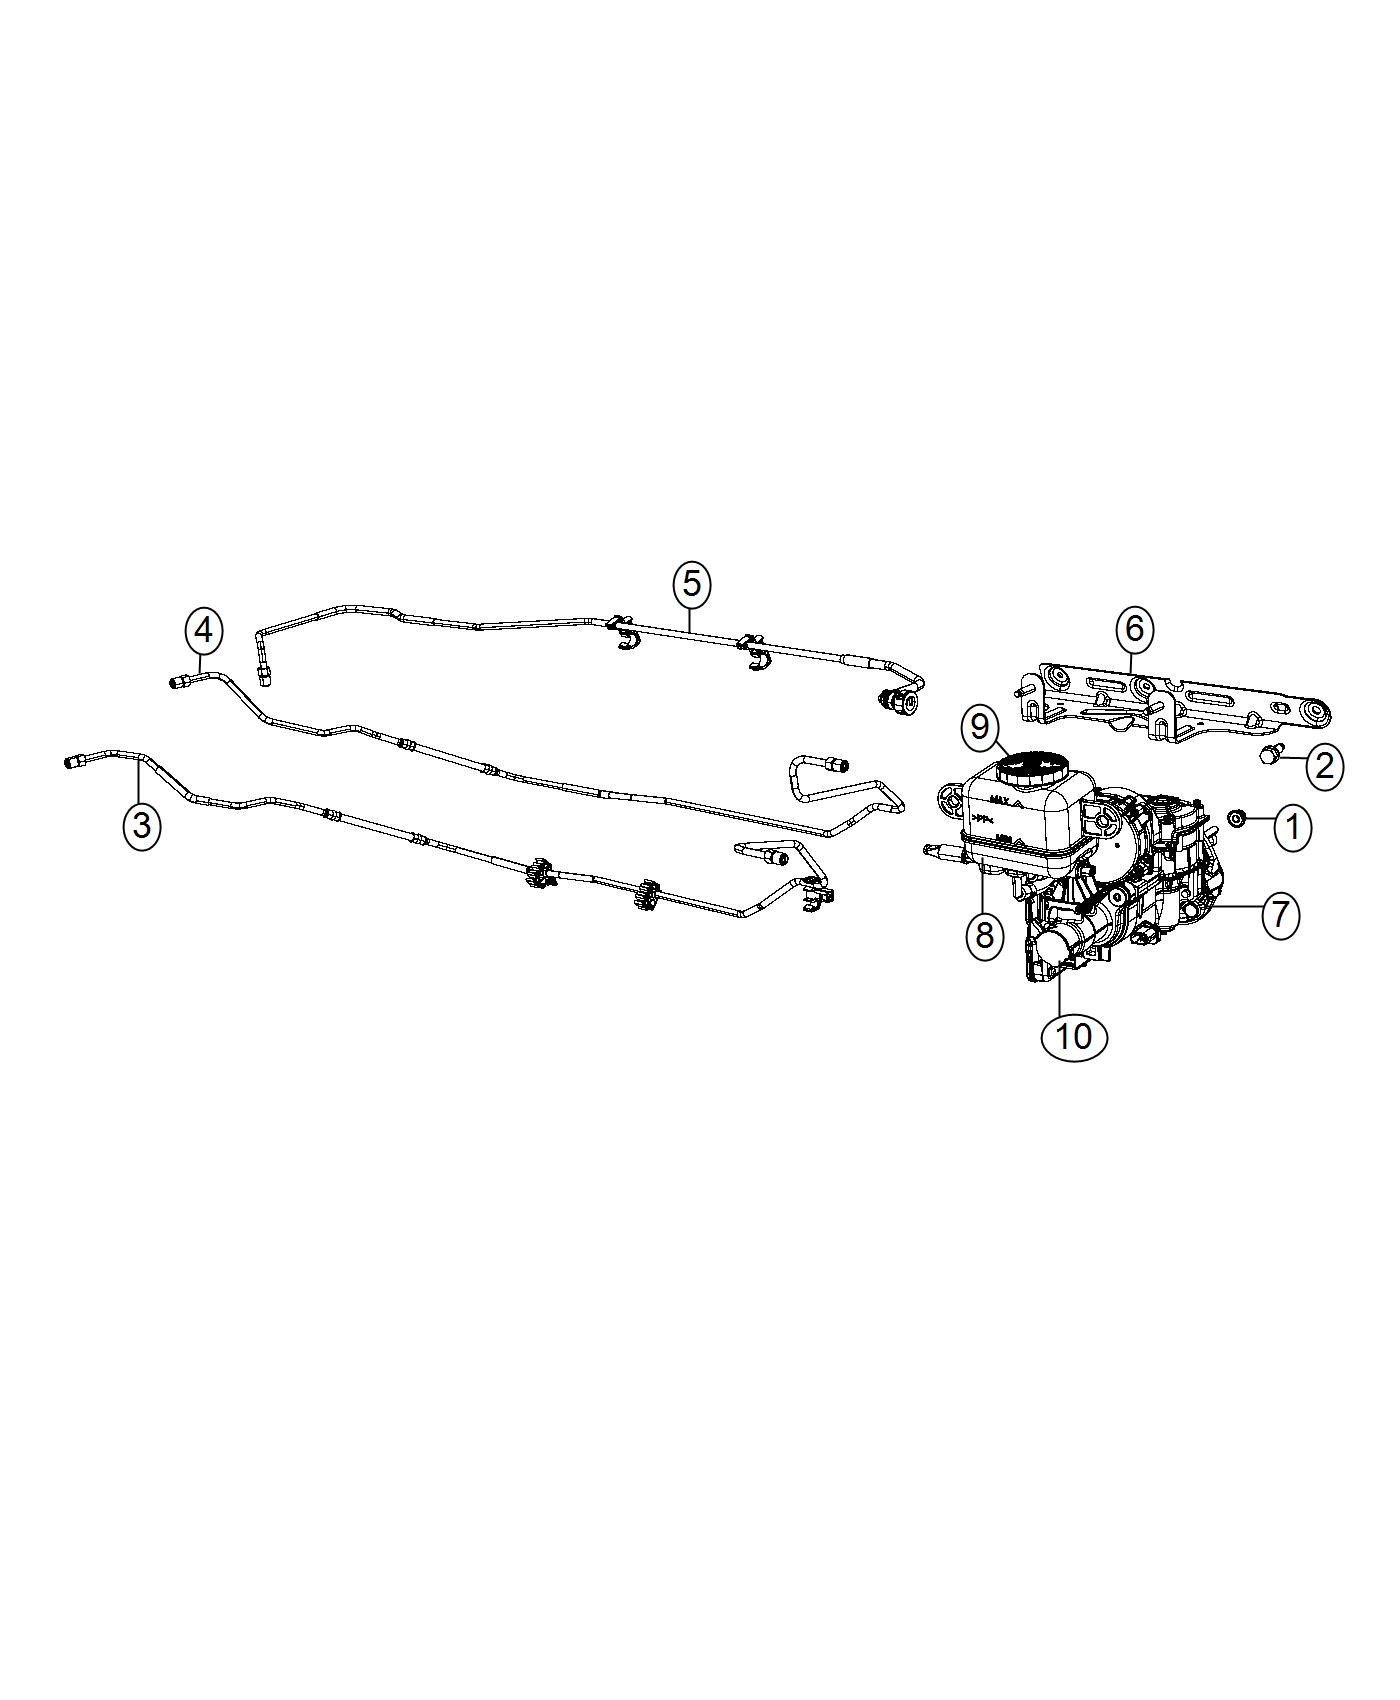 2017 Chrysler Pacifica Reservoir. Brake master cylinder